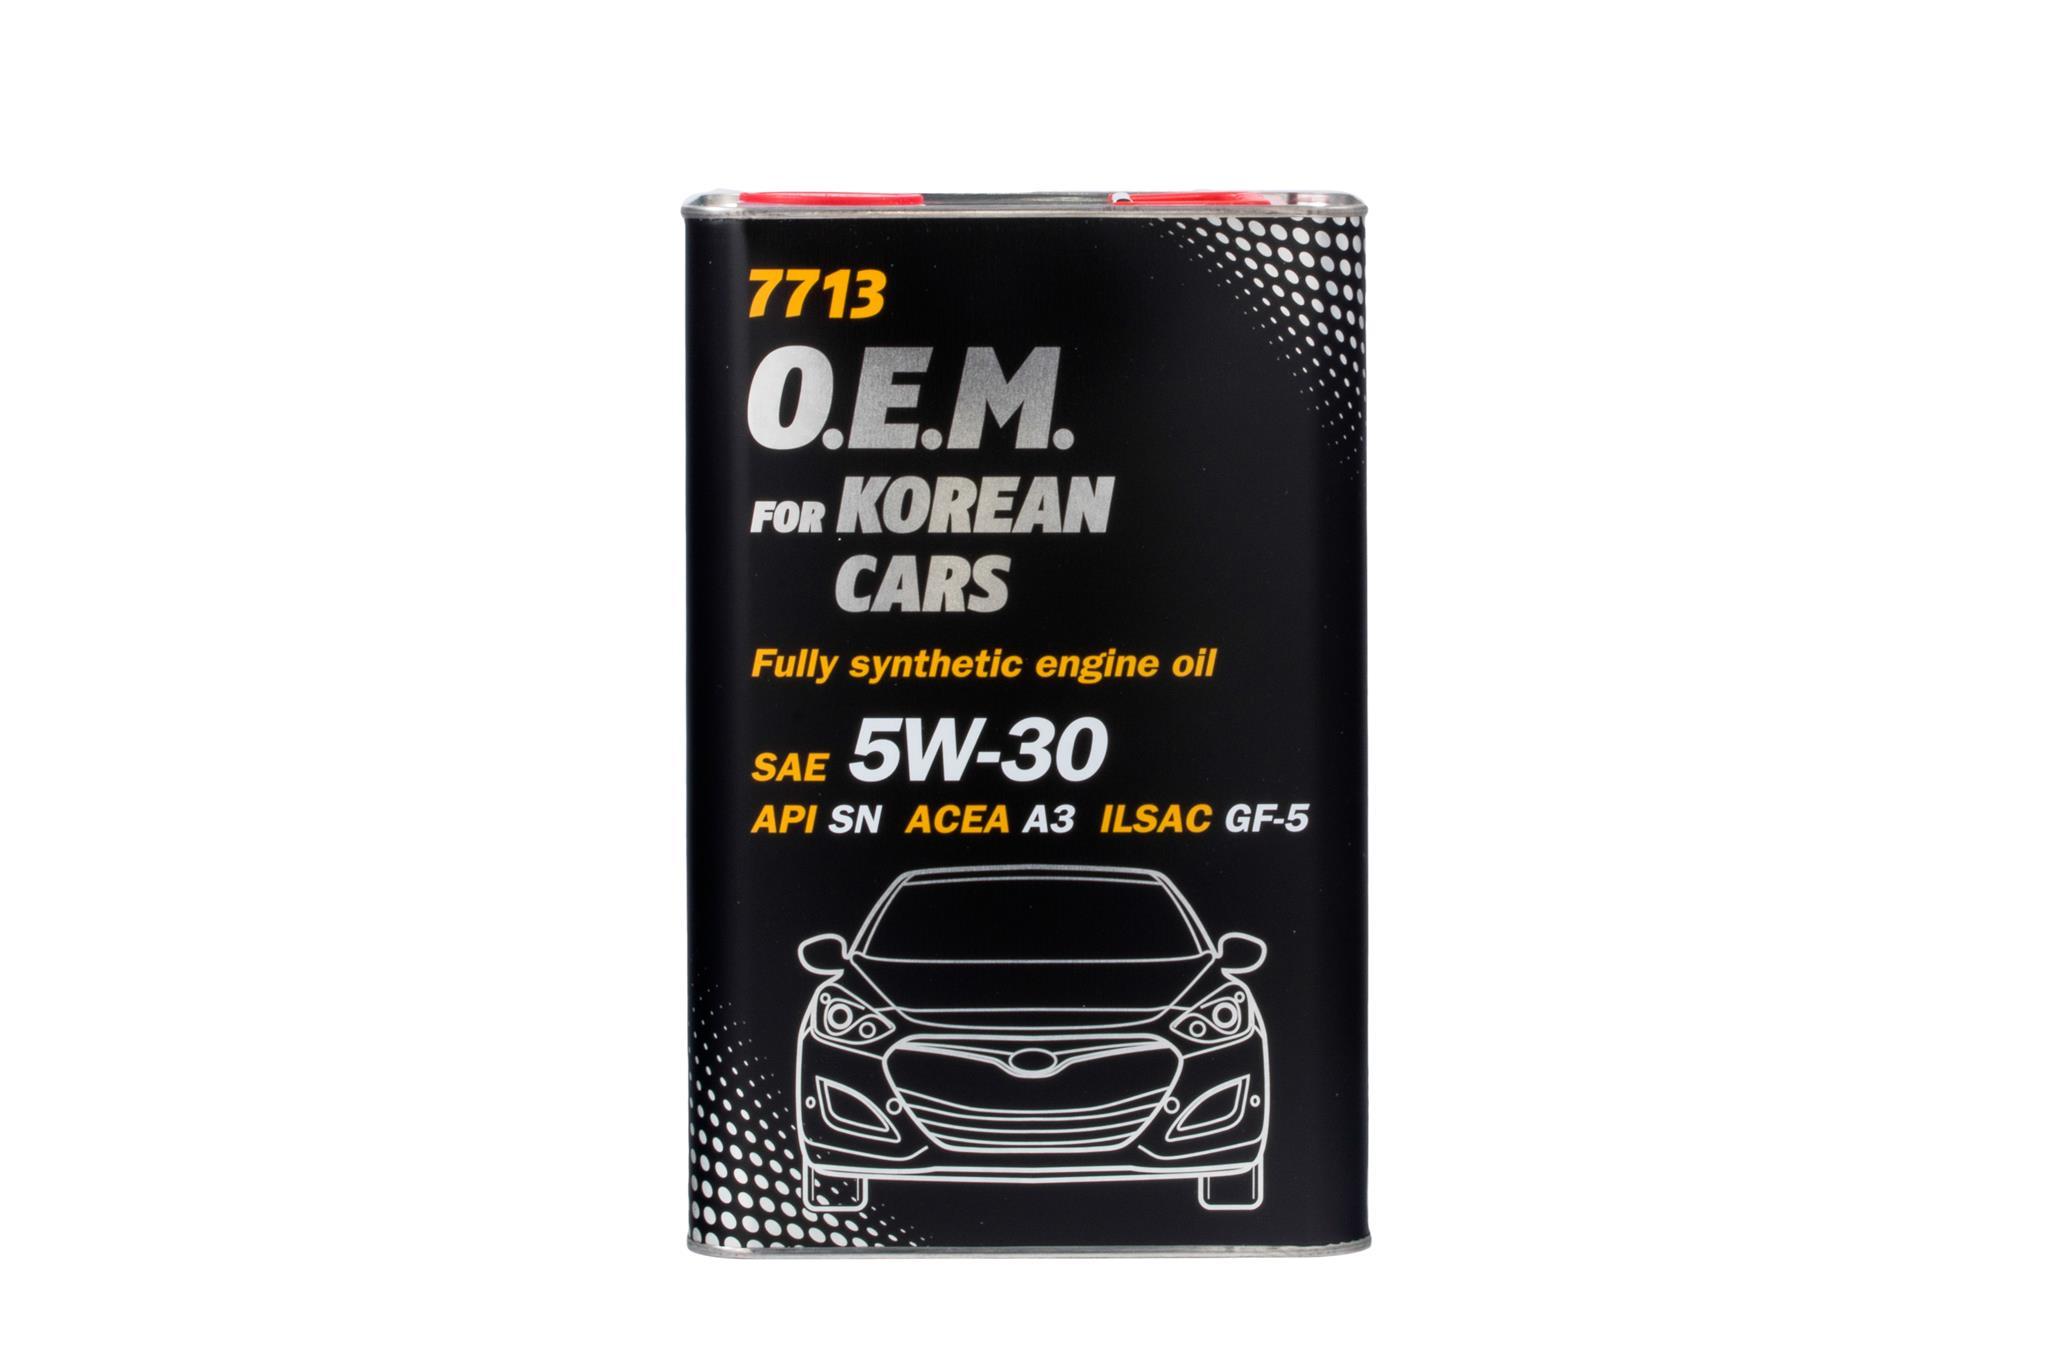 Масло моторное 5w30 Mannol O.E.M. для корейских автомобилей 7713 SN/SM/SL 4л